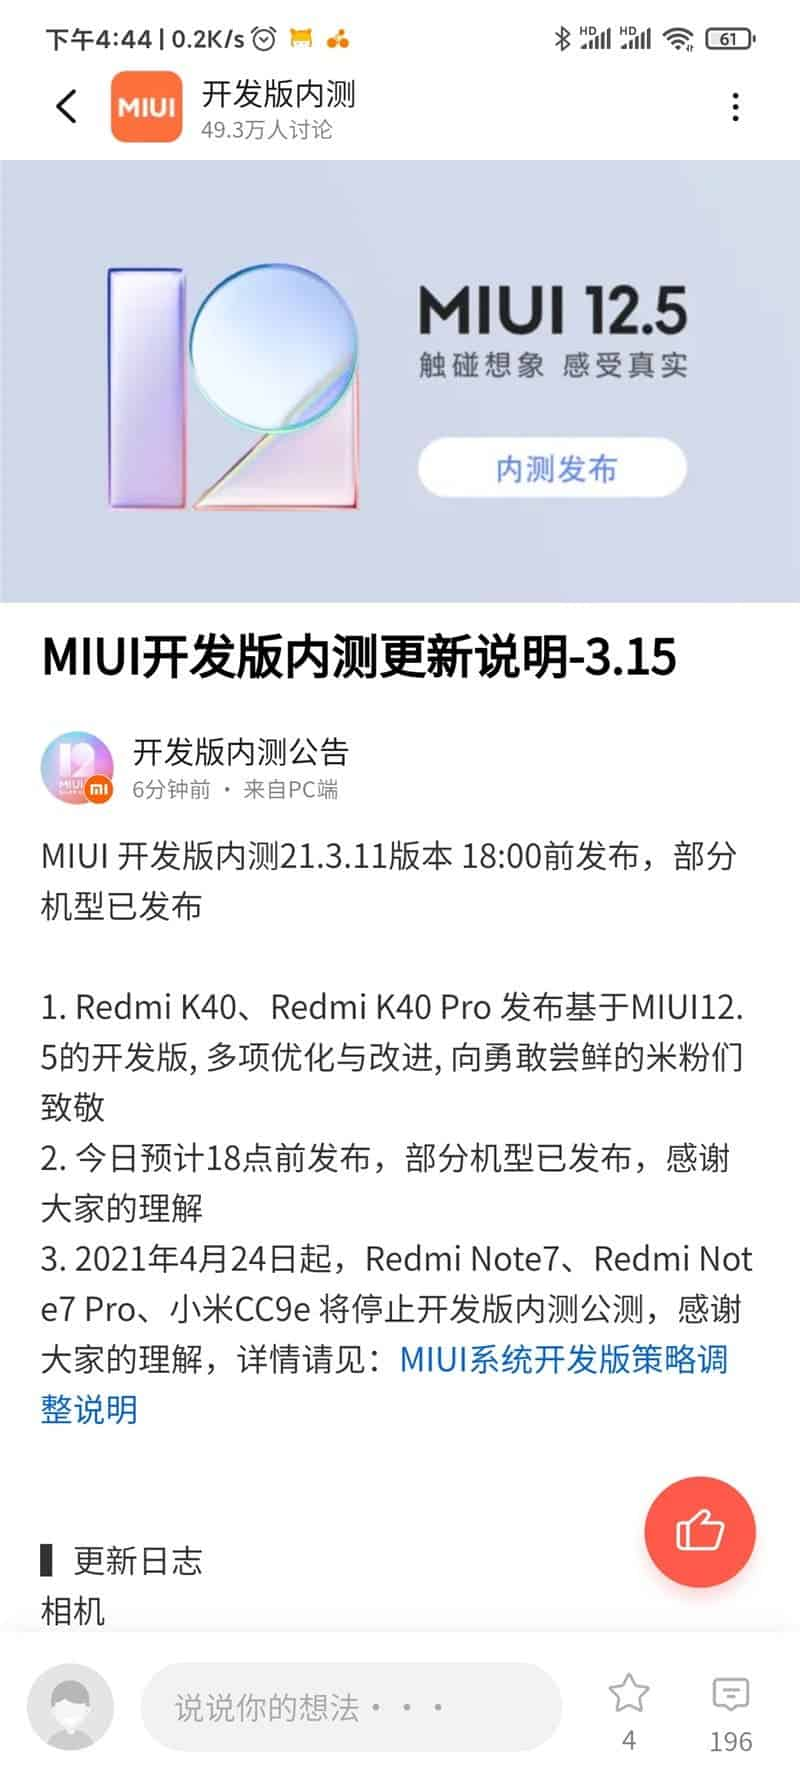 MIUI 12.5 development version